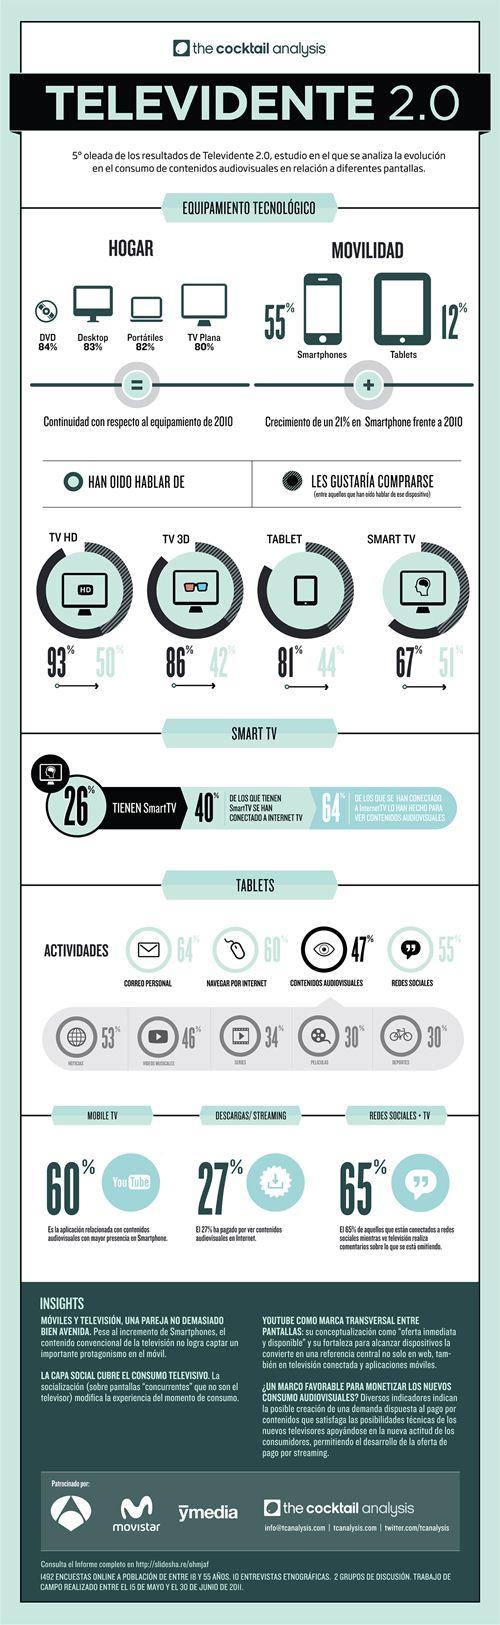 Infografia Televidente 2.0